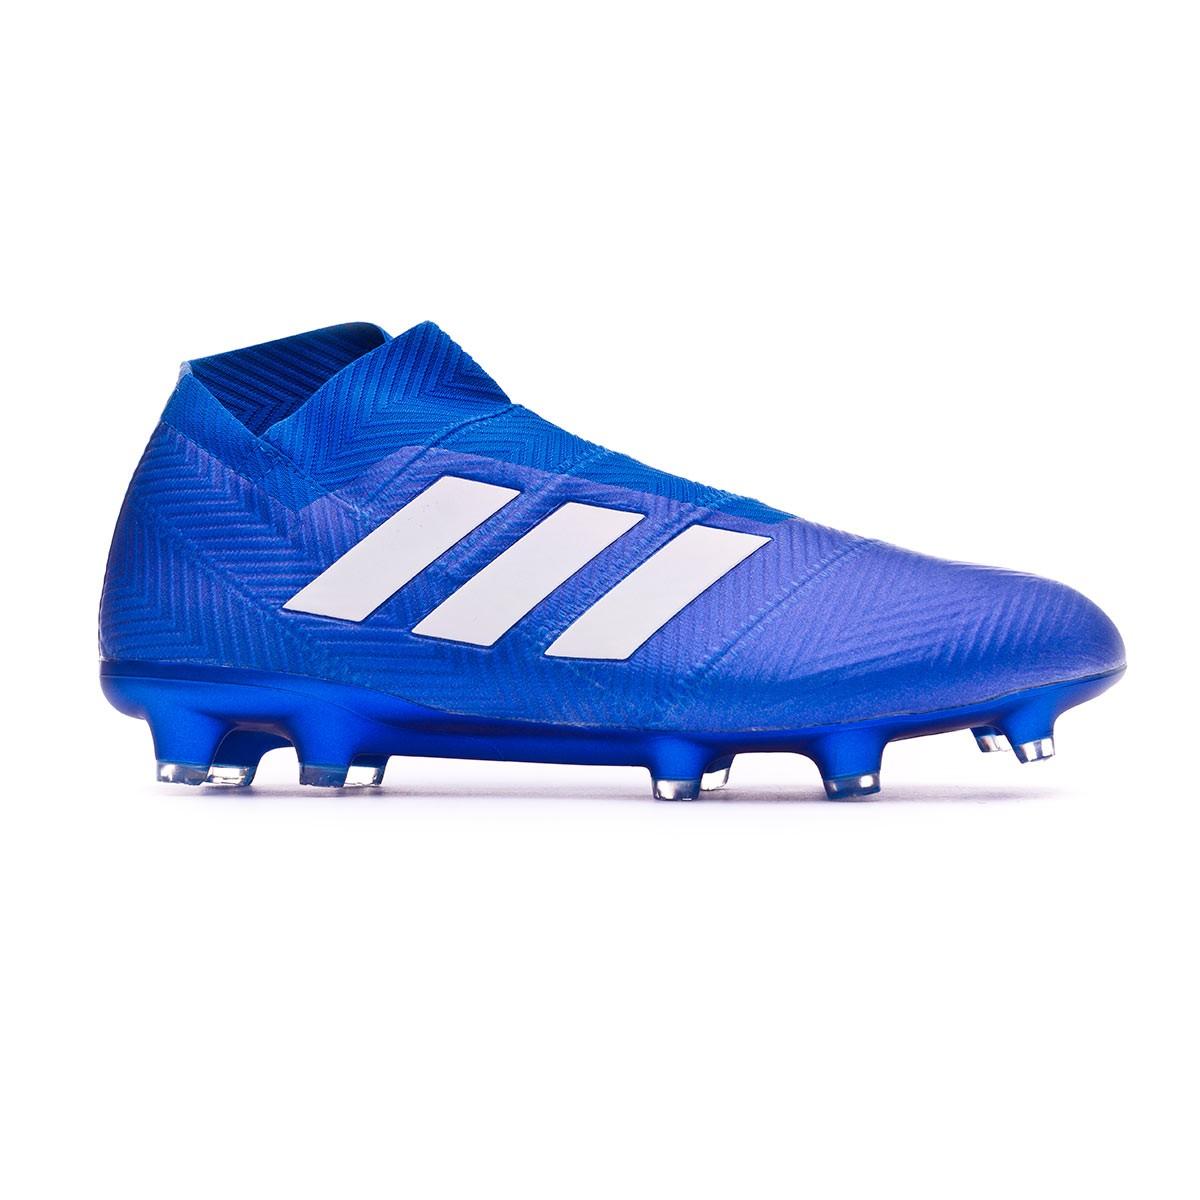 hot sale online 9257e 3a69f Football Boots adidas Nemeziz 18+ FG Football blue-White - Tienda de fútbol  Fútbol Emotion